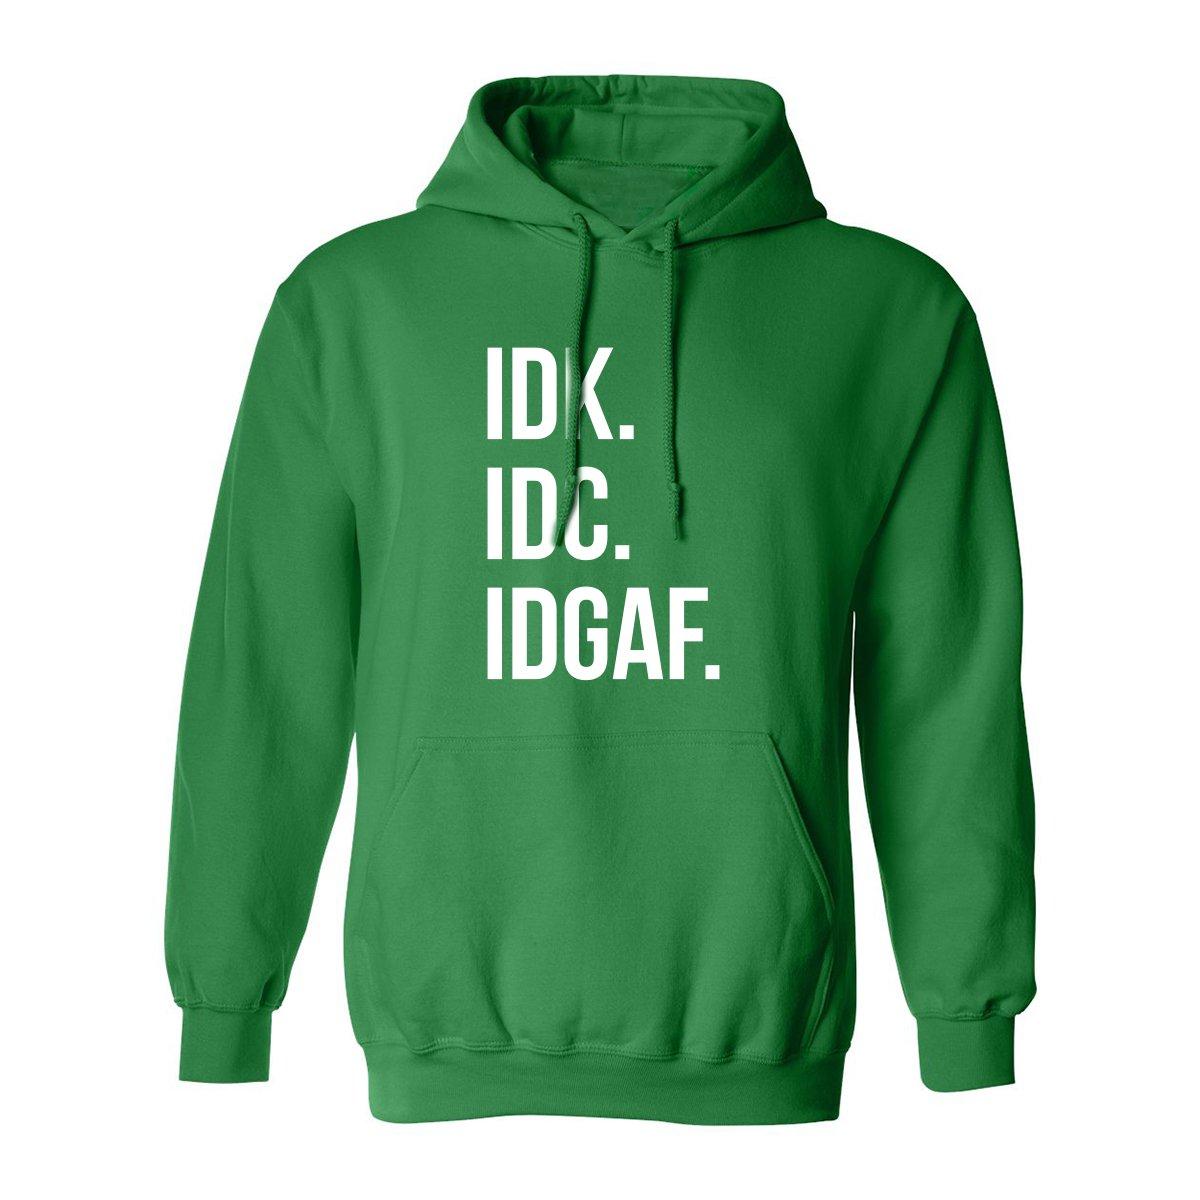 ZeroGravitee IDK.IDC.IDGAF. Adult Hooded Sweatshirt PA-3815-HD